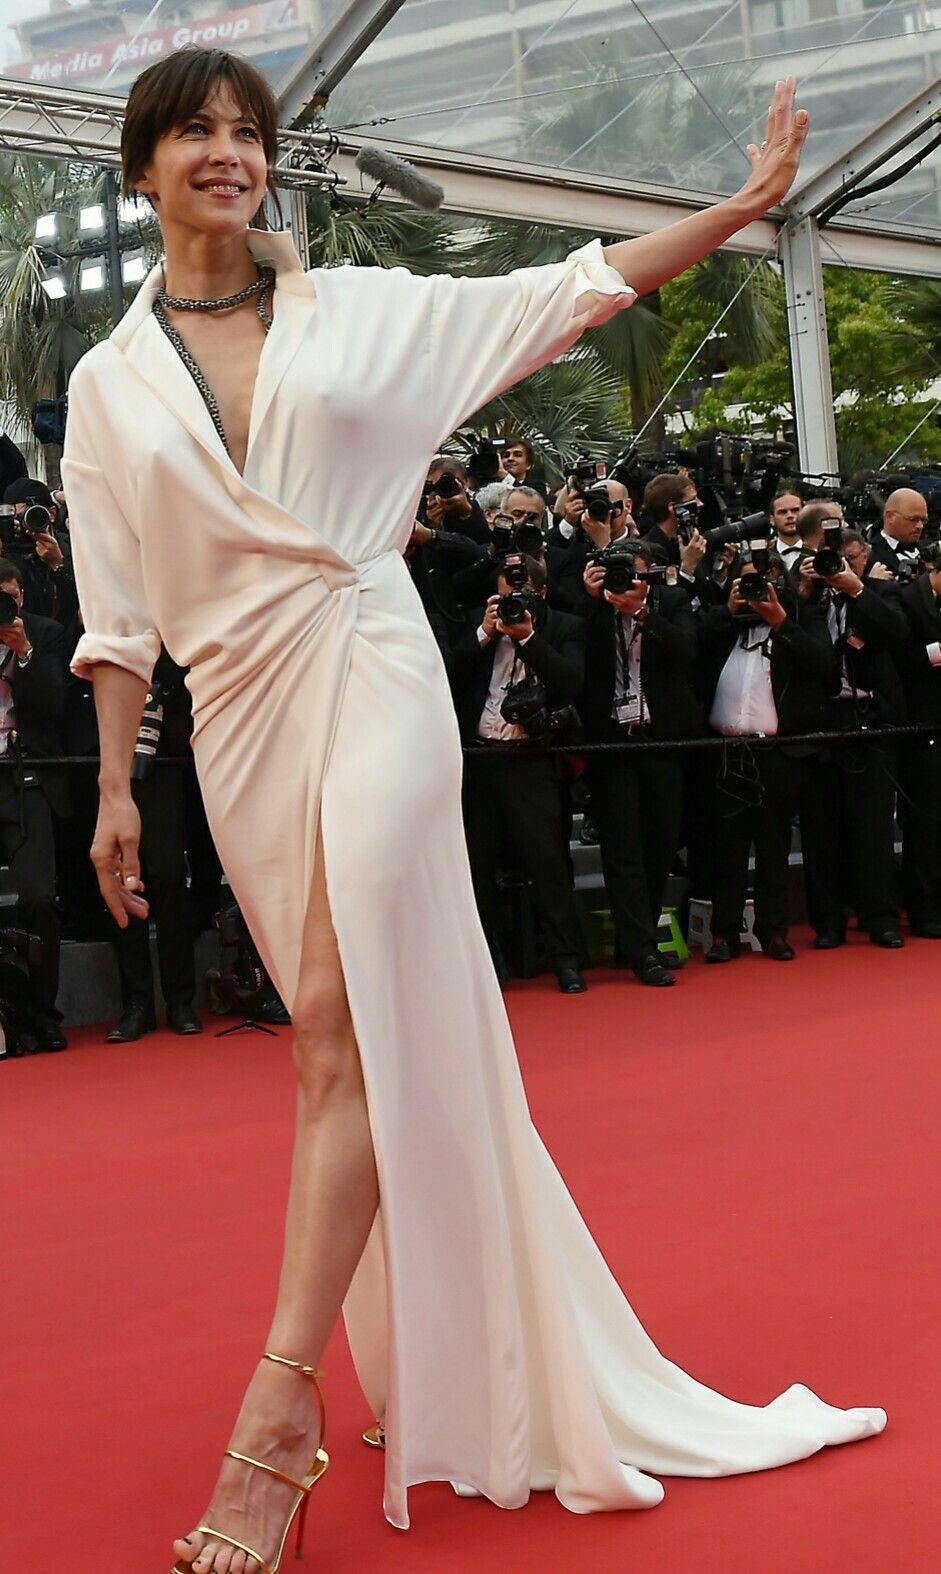 Hacked Sophie Marceau nudes (15 photos), Topless, Hot, Twitter, braless 2019